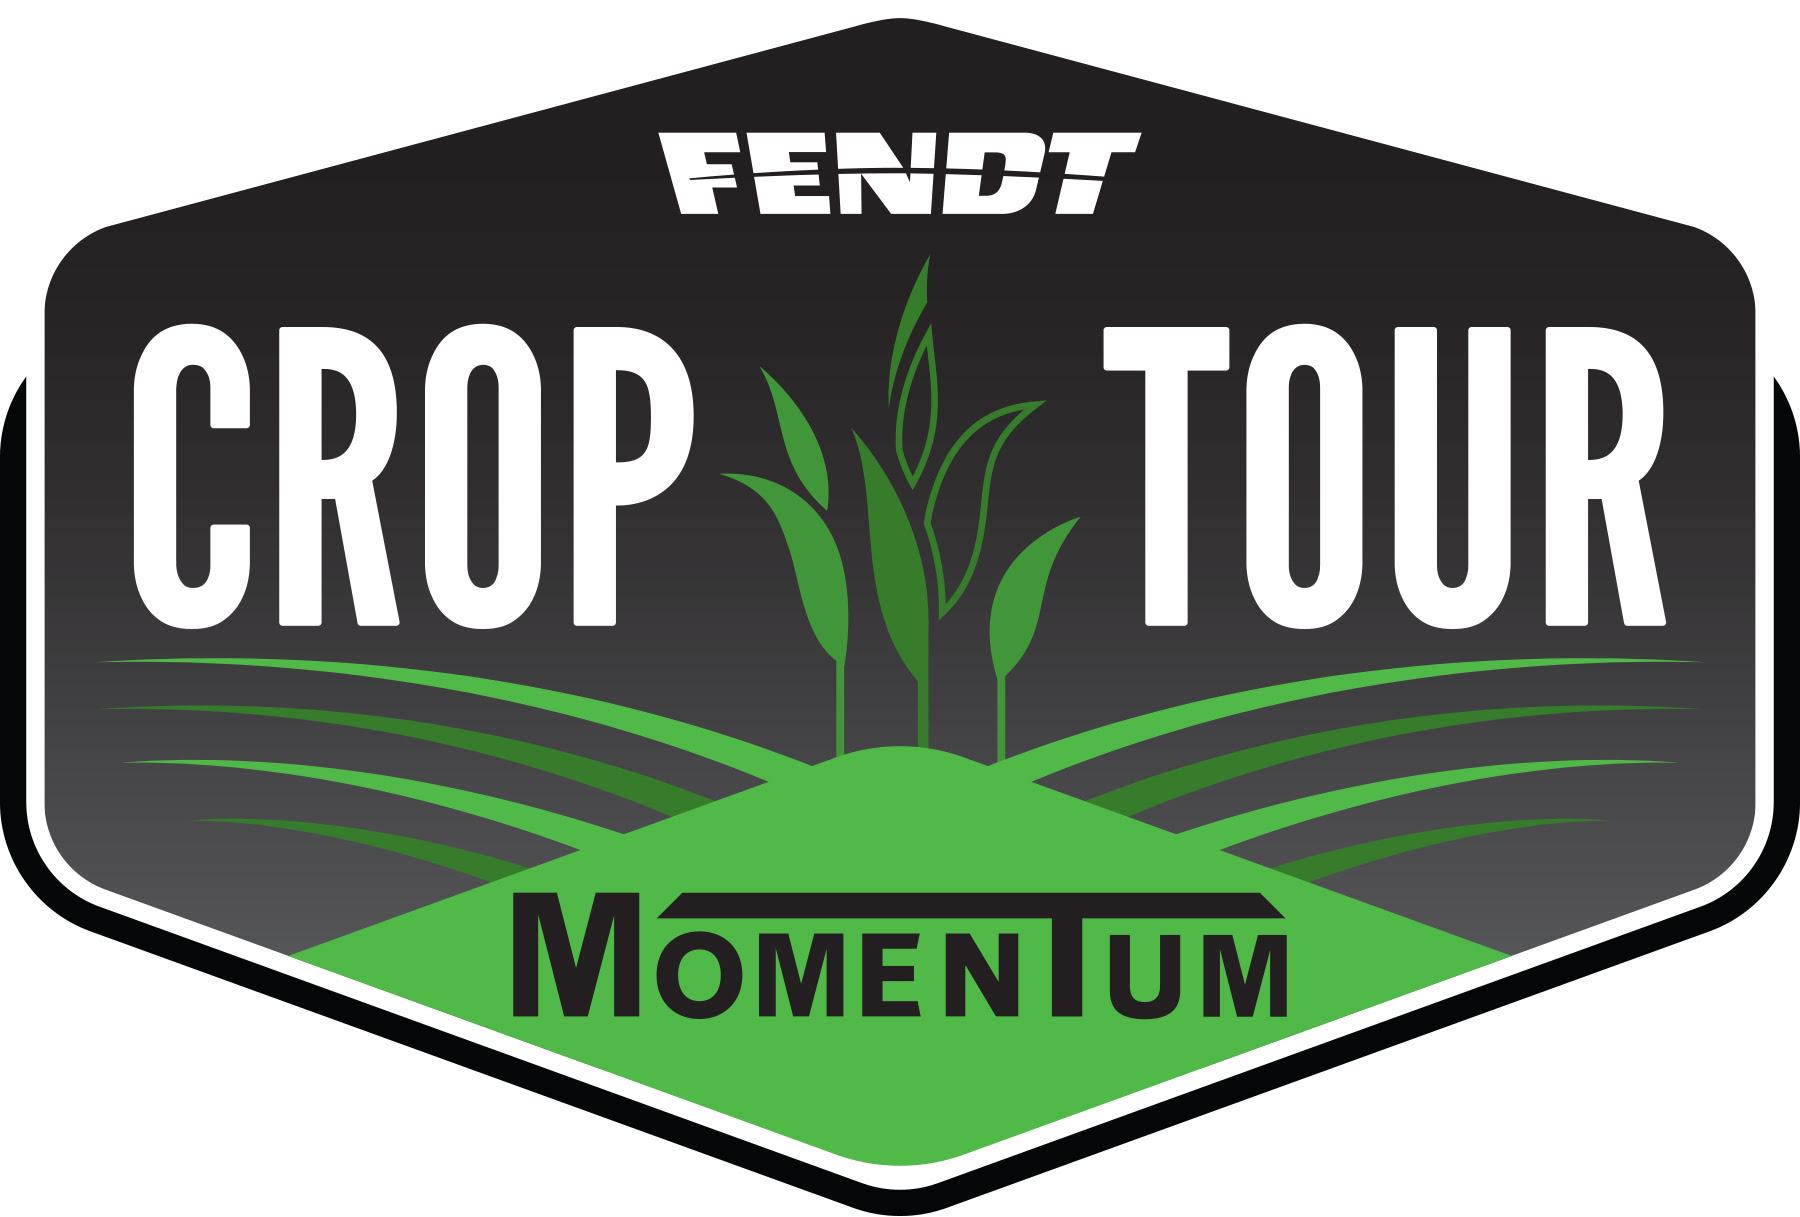 crop-tour-logo-fendt-momentum-branded